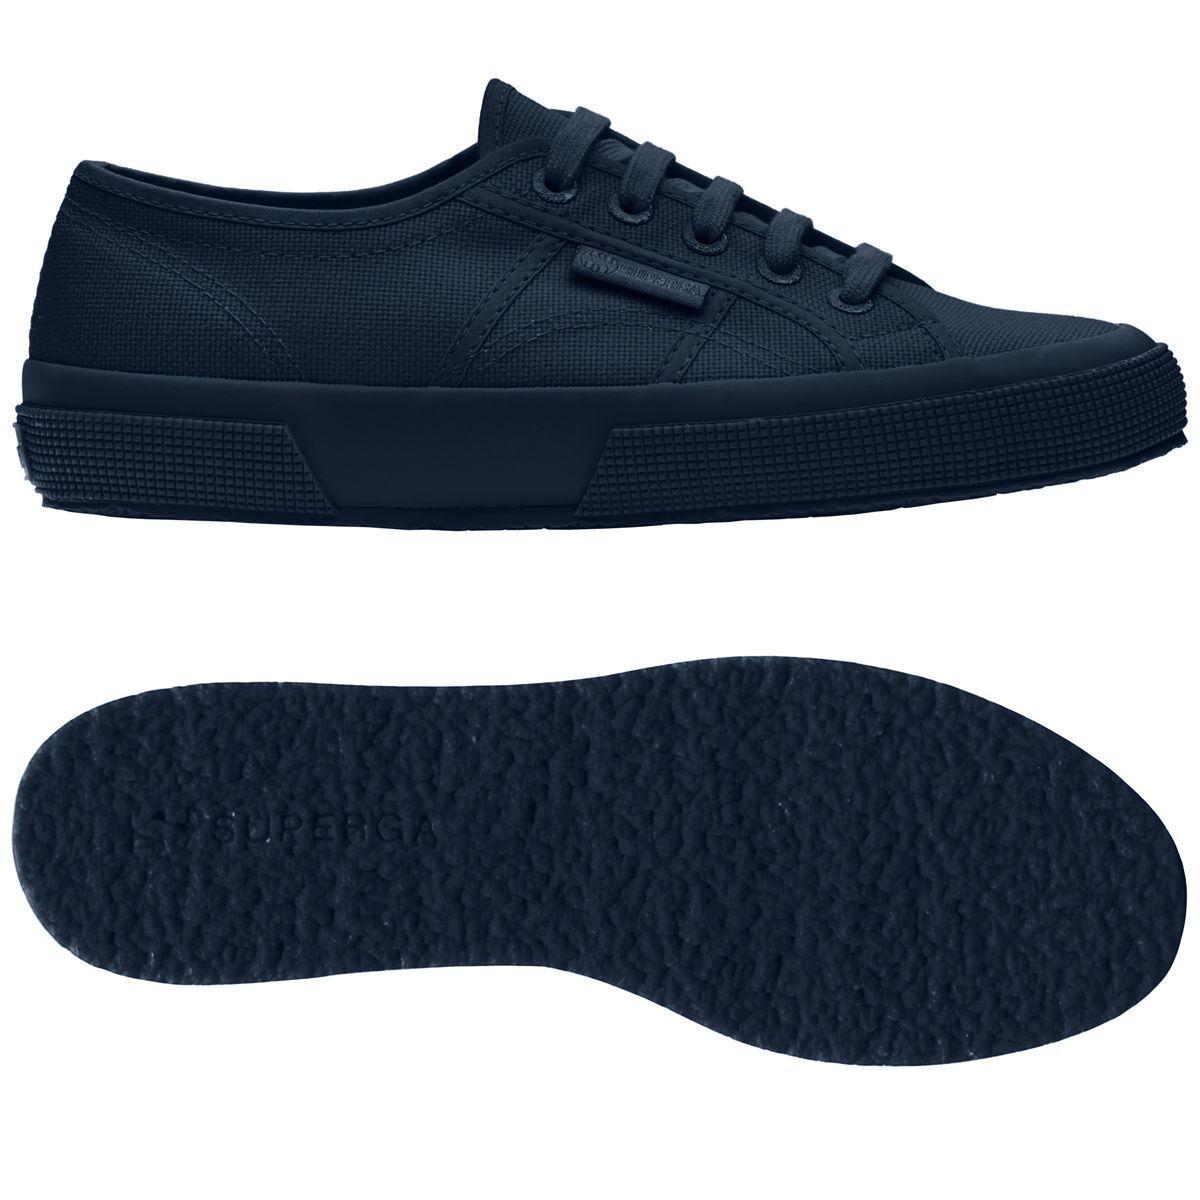 zapatos Superga Man - 2750 Cotu Classic Canvas-Total Navy - 2750tot